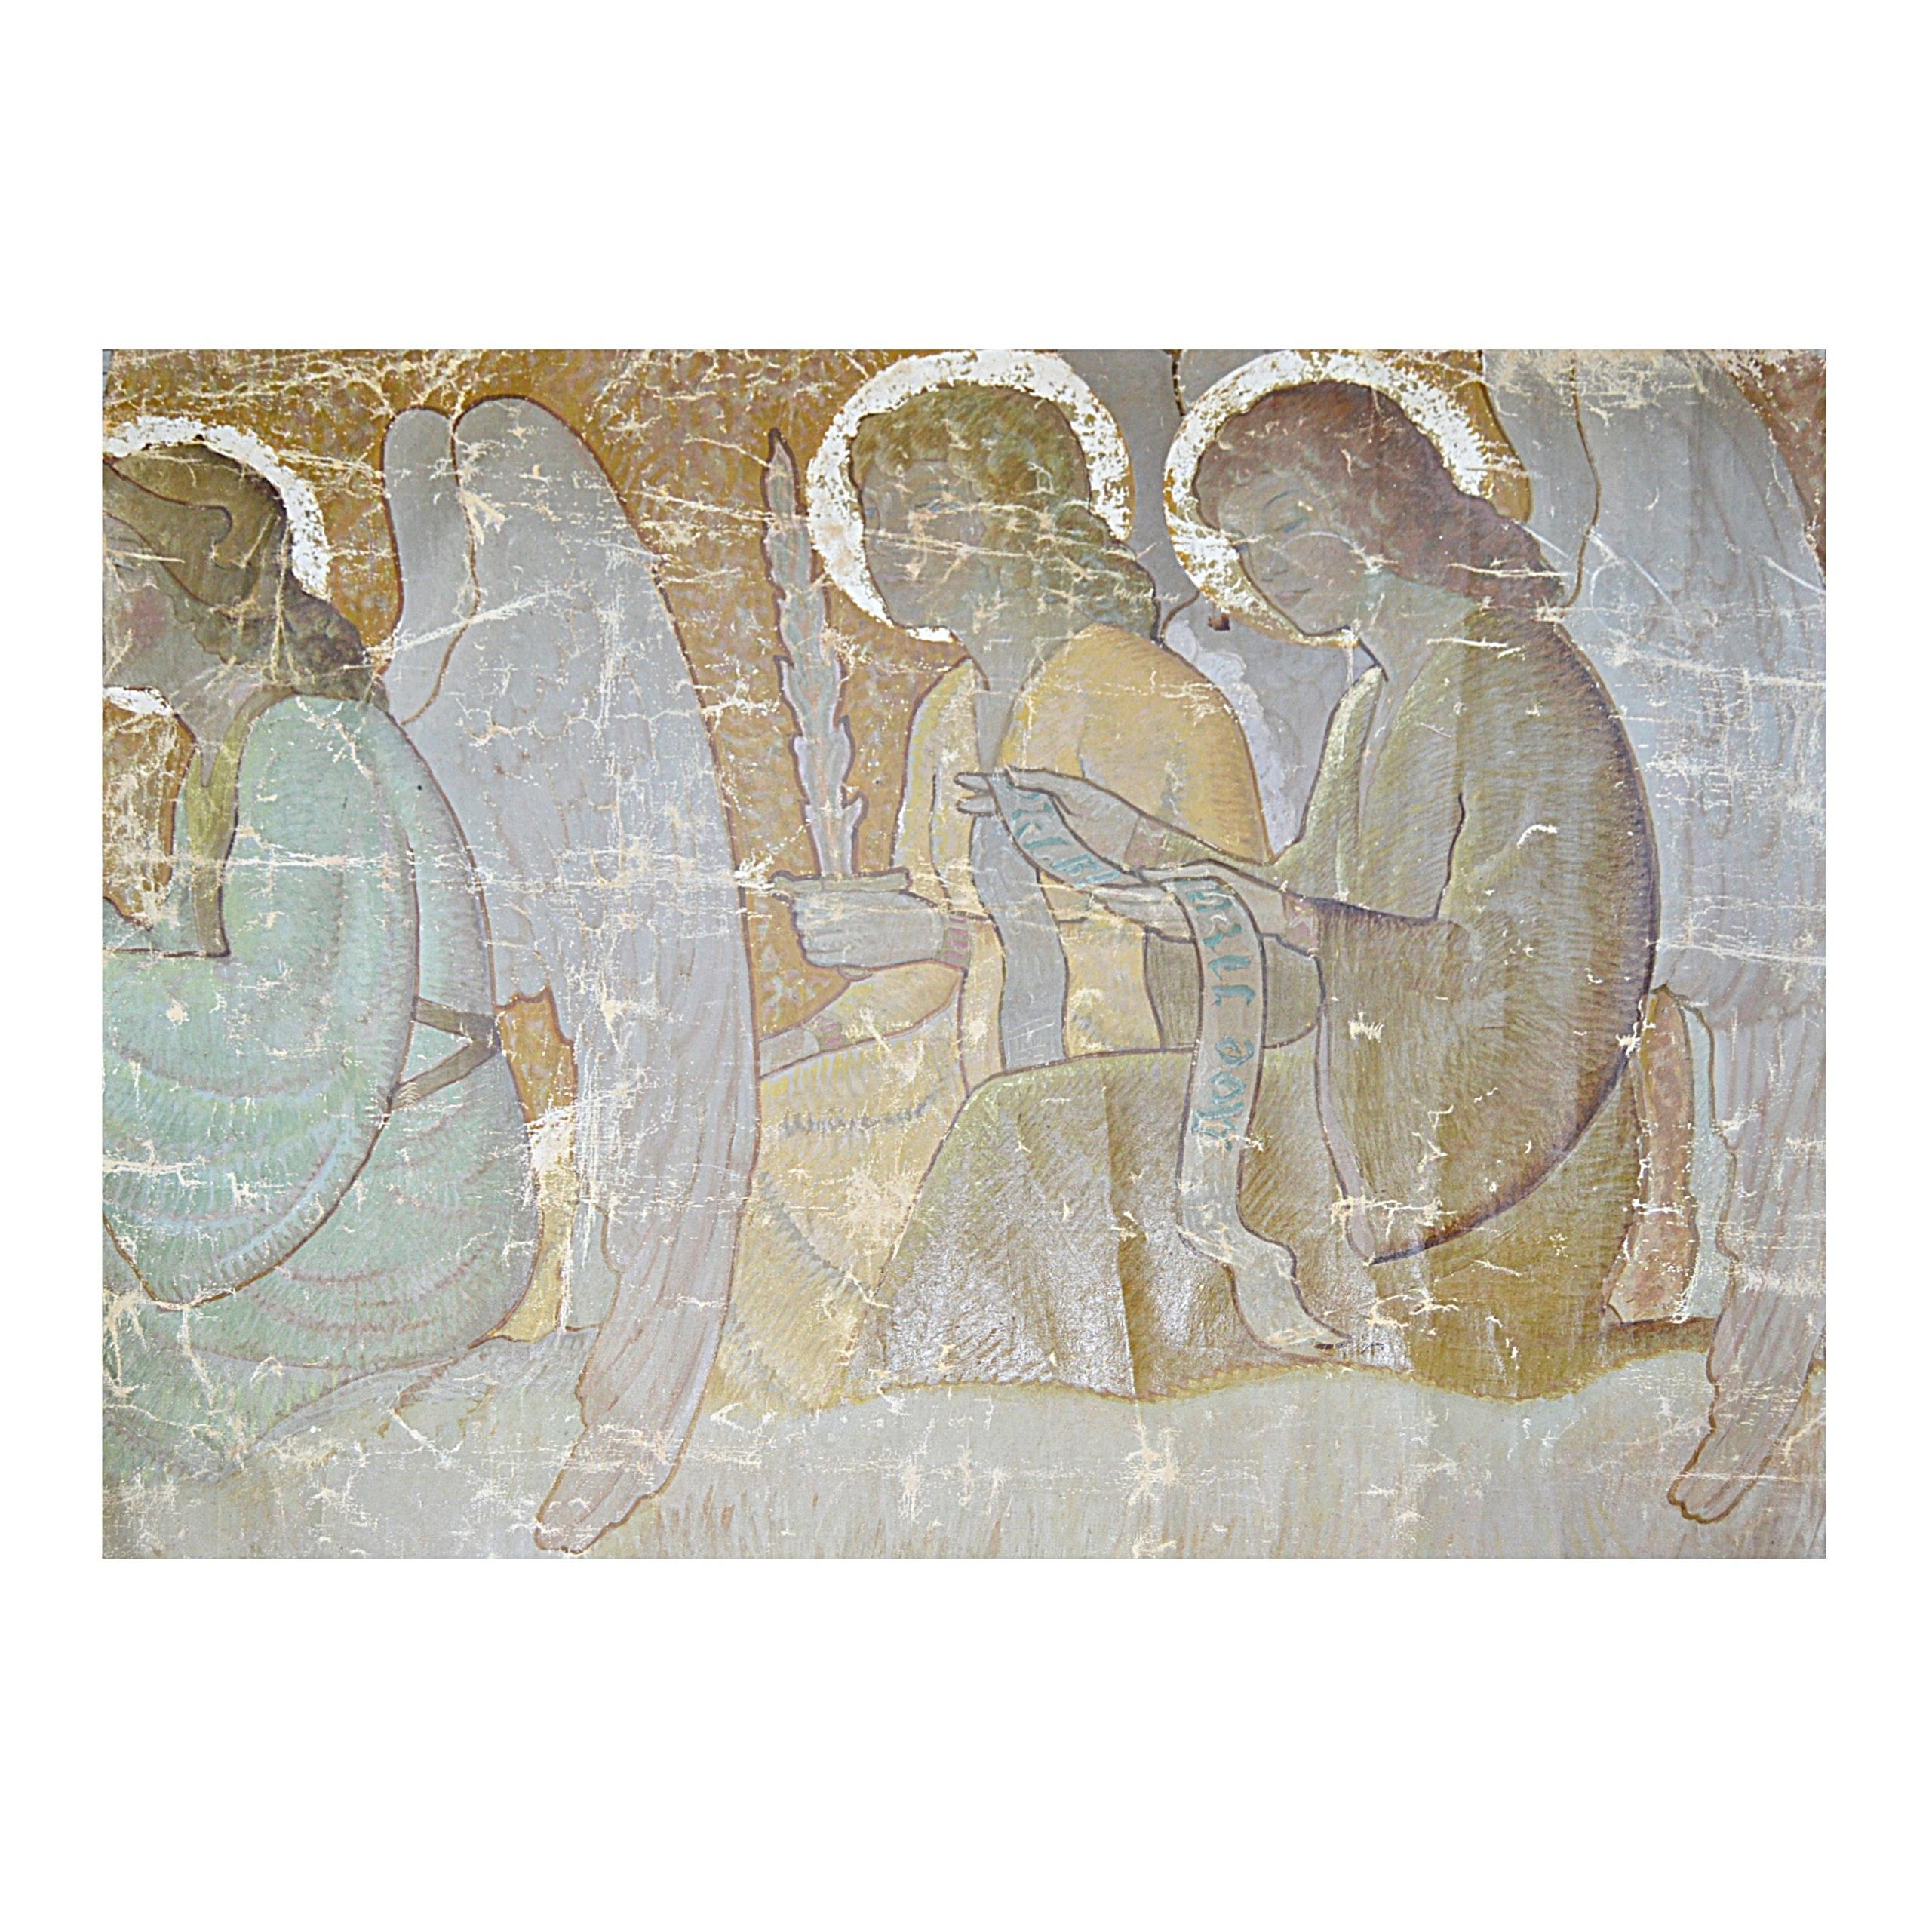 19th-Century Ecclesiastical Oil on Canvas Mural Fragment